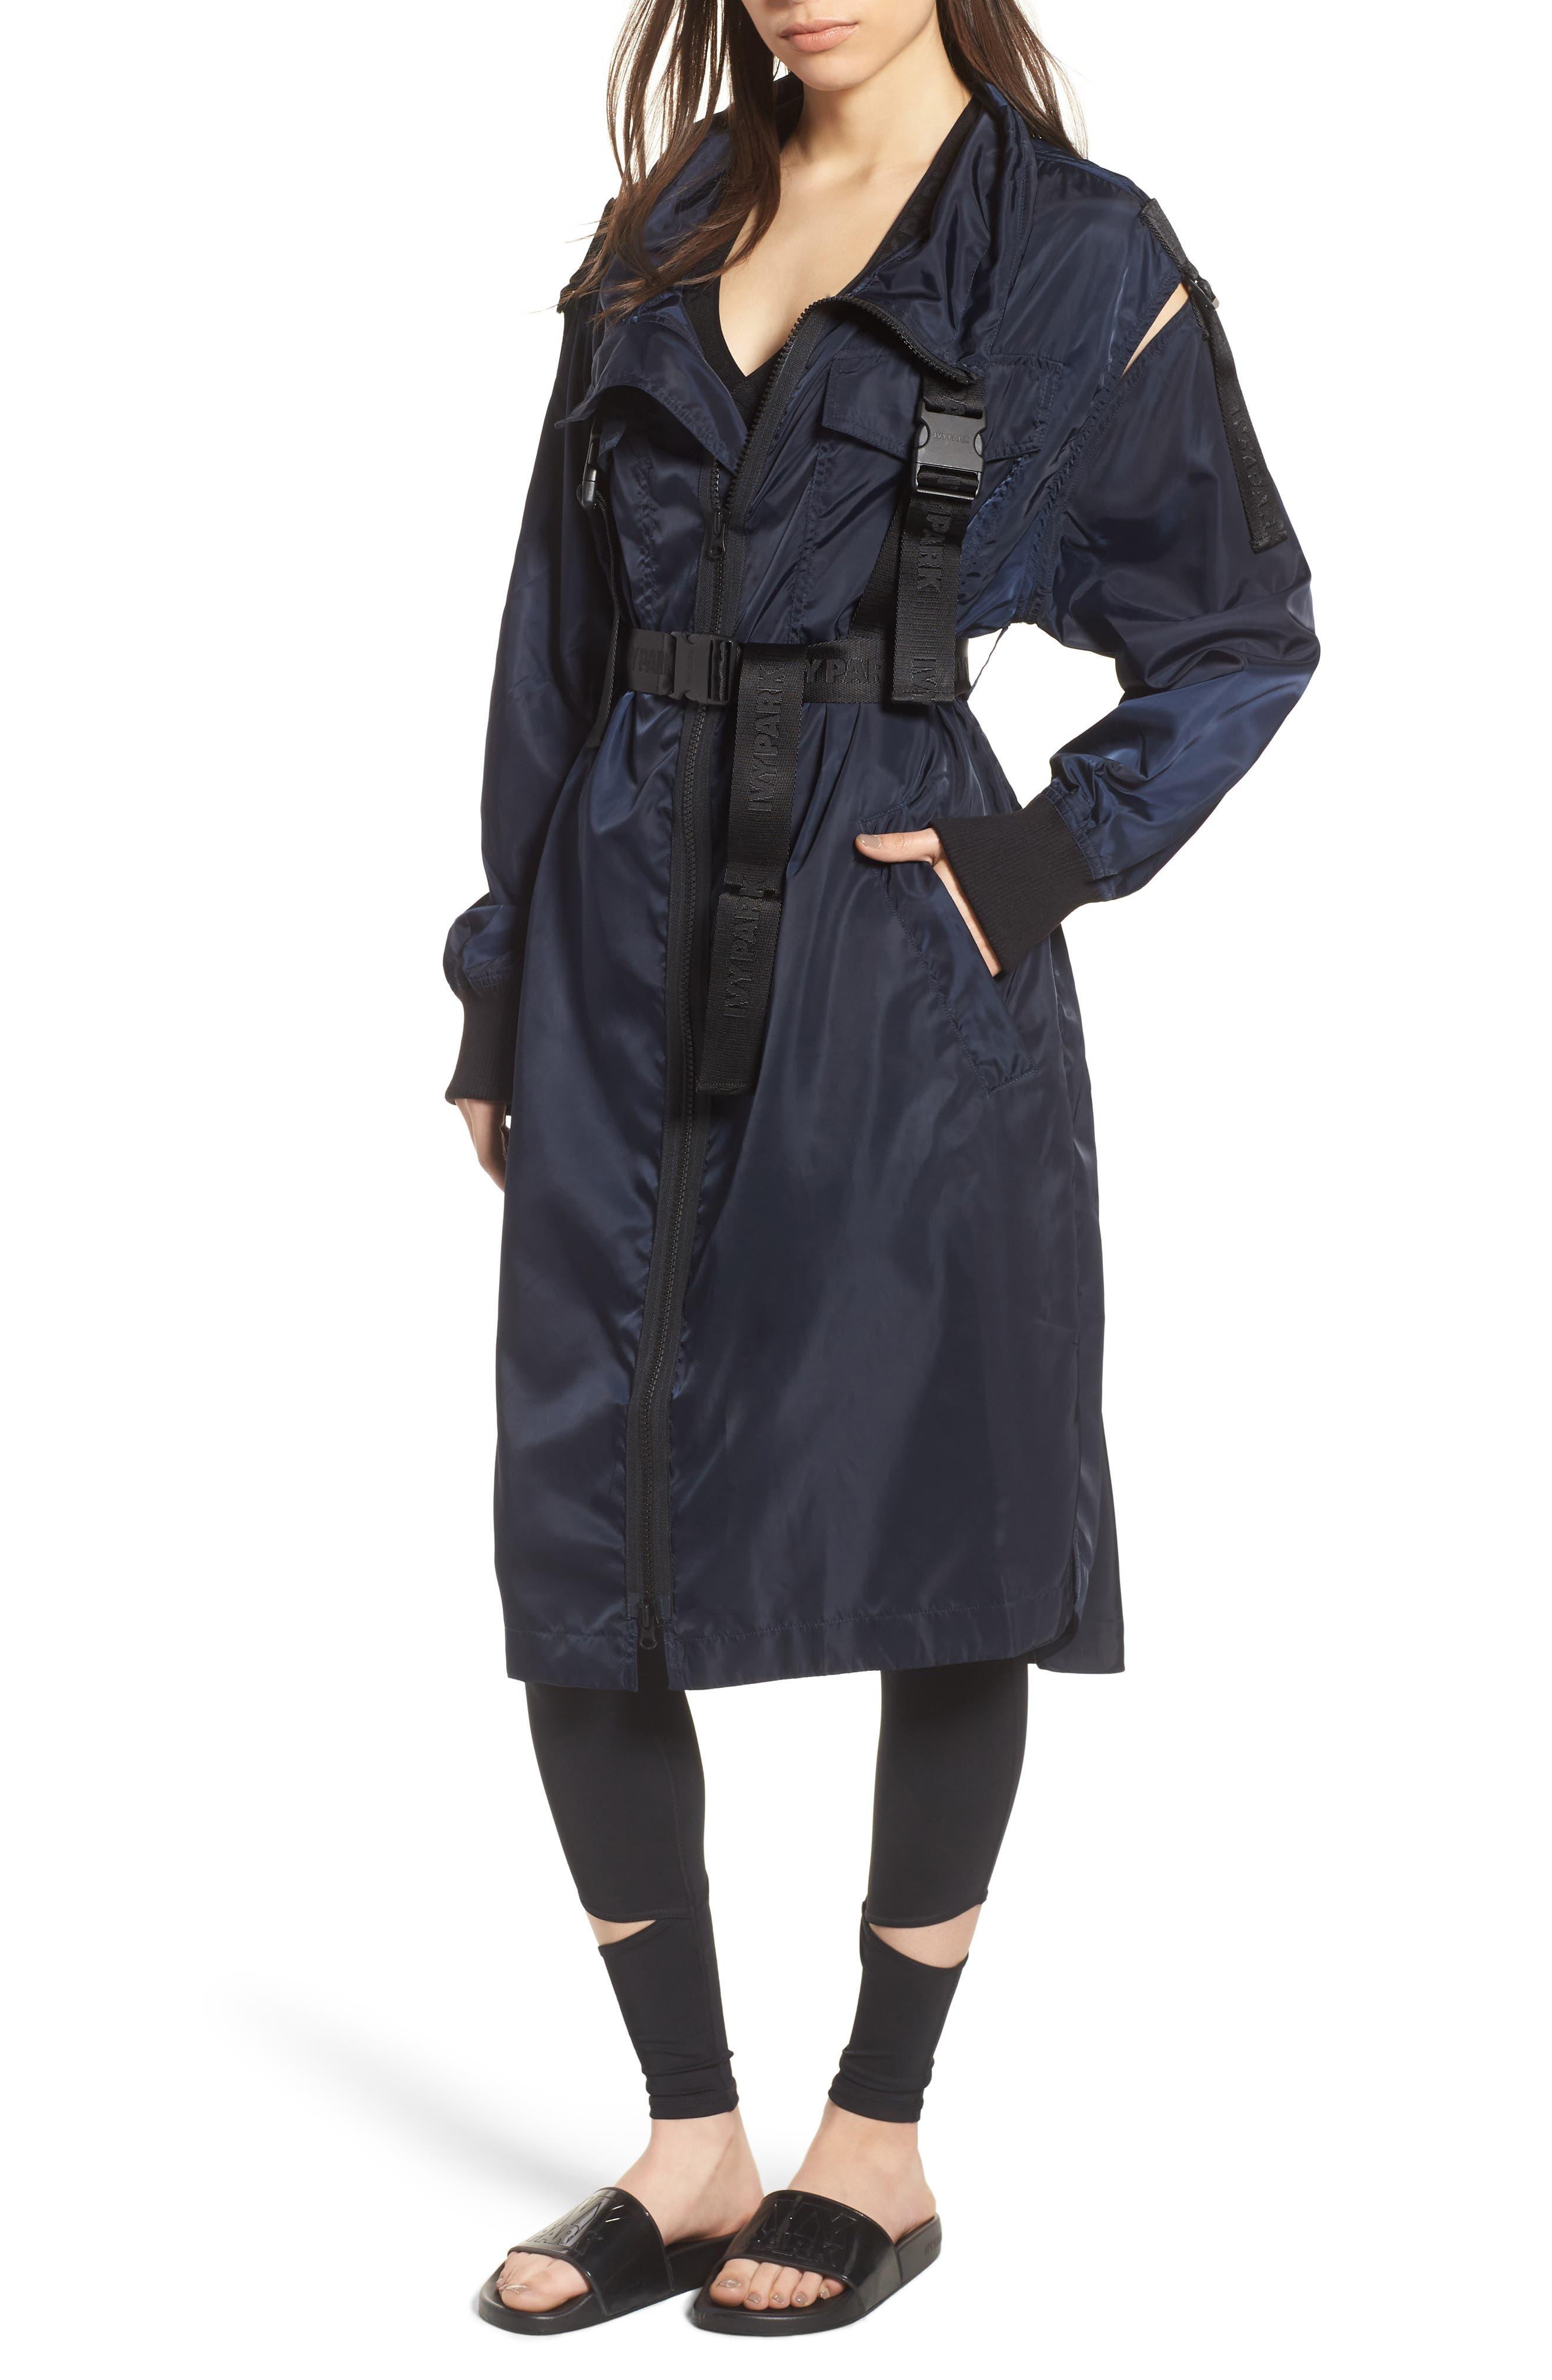 IVY PARK® Harness Jacket